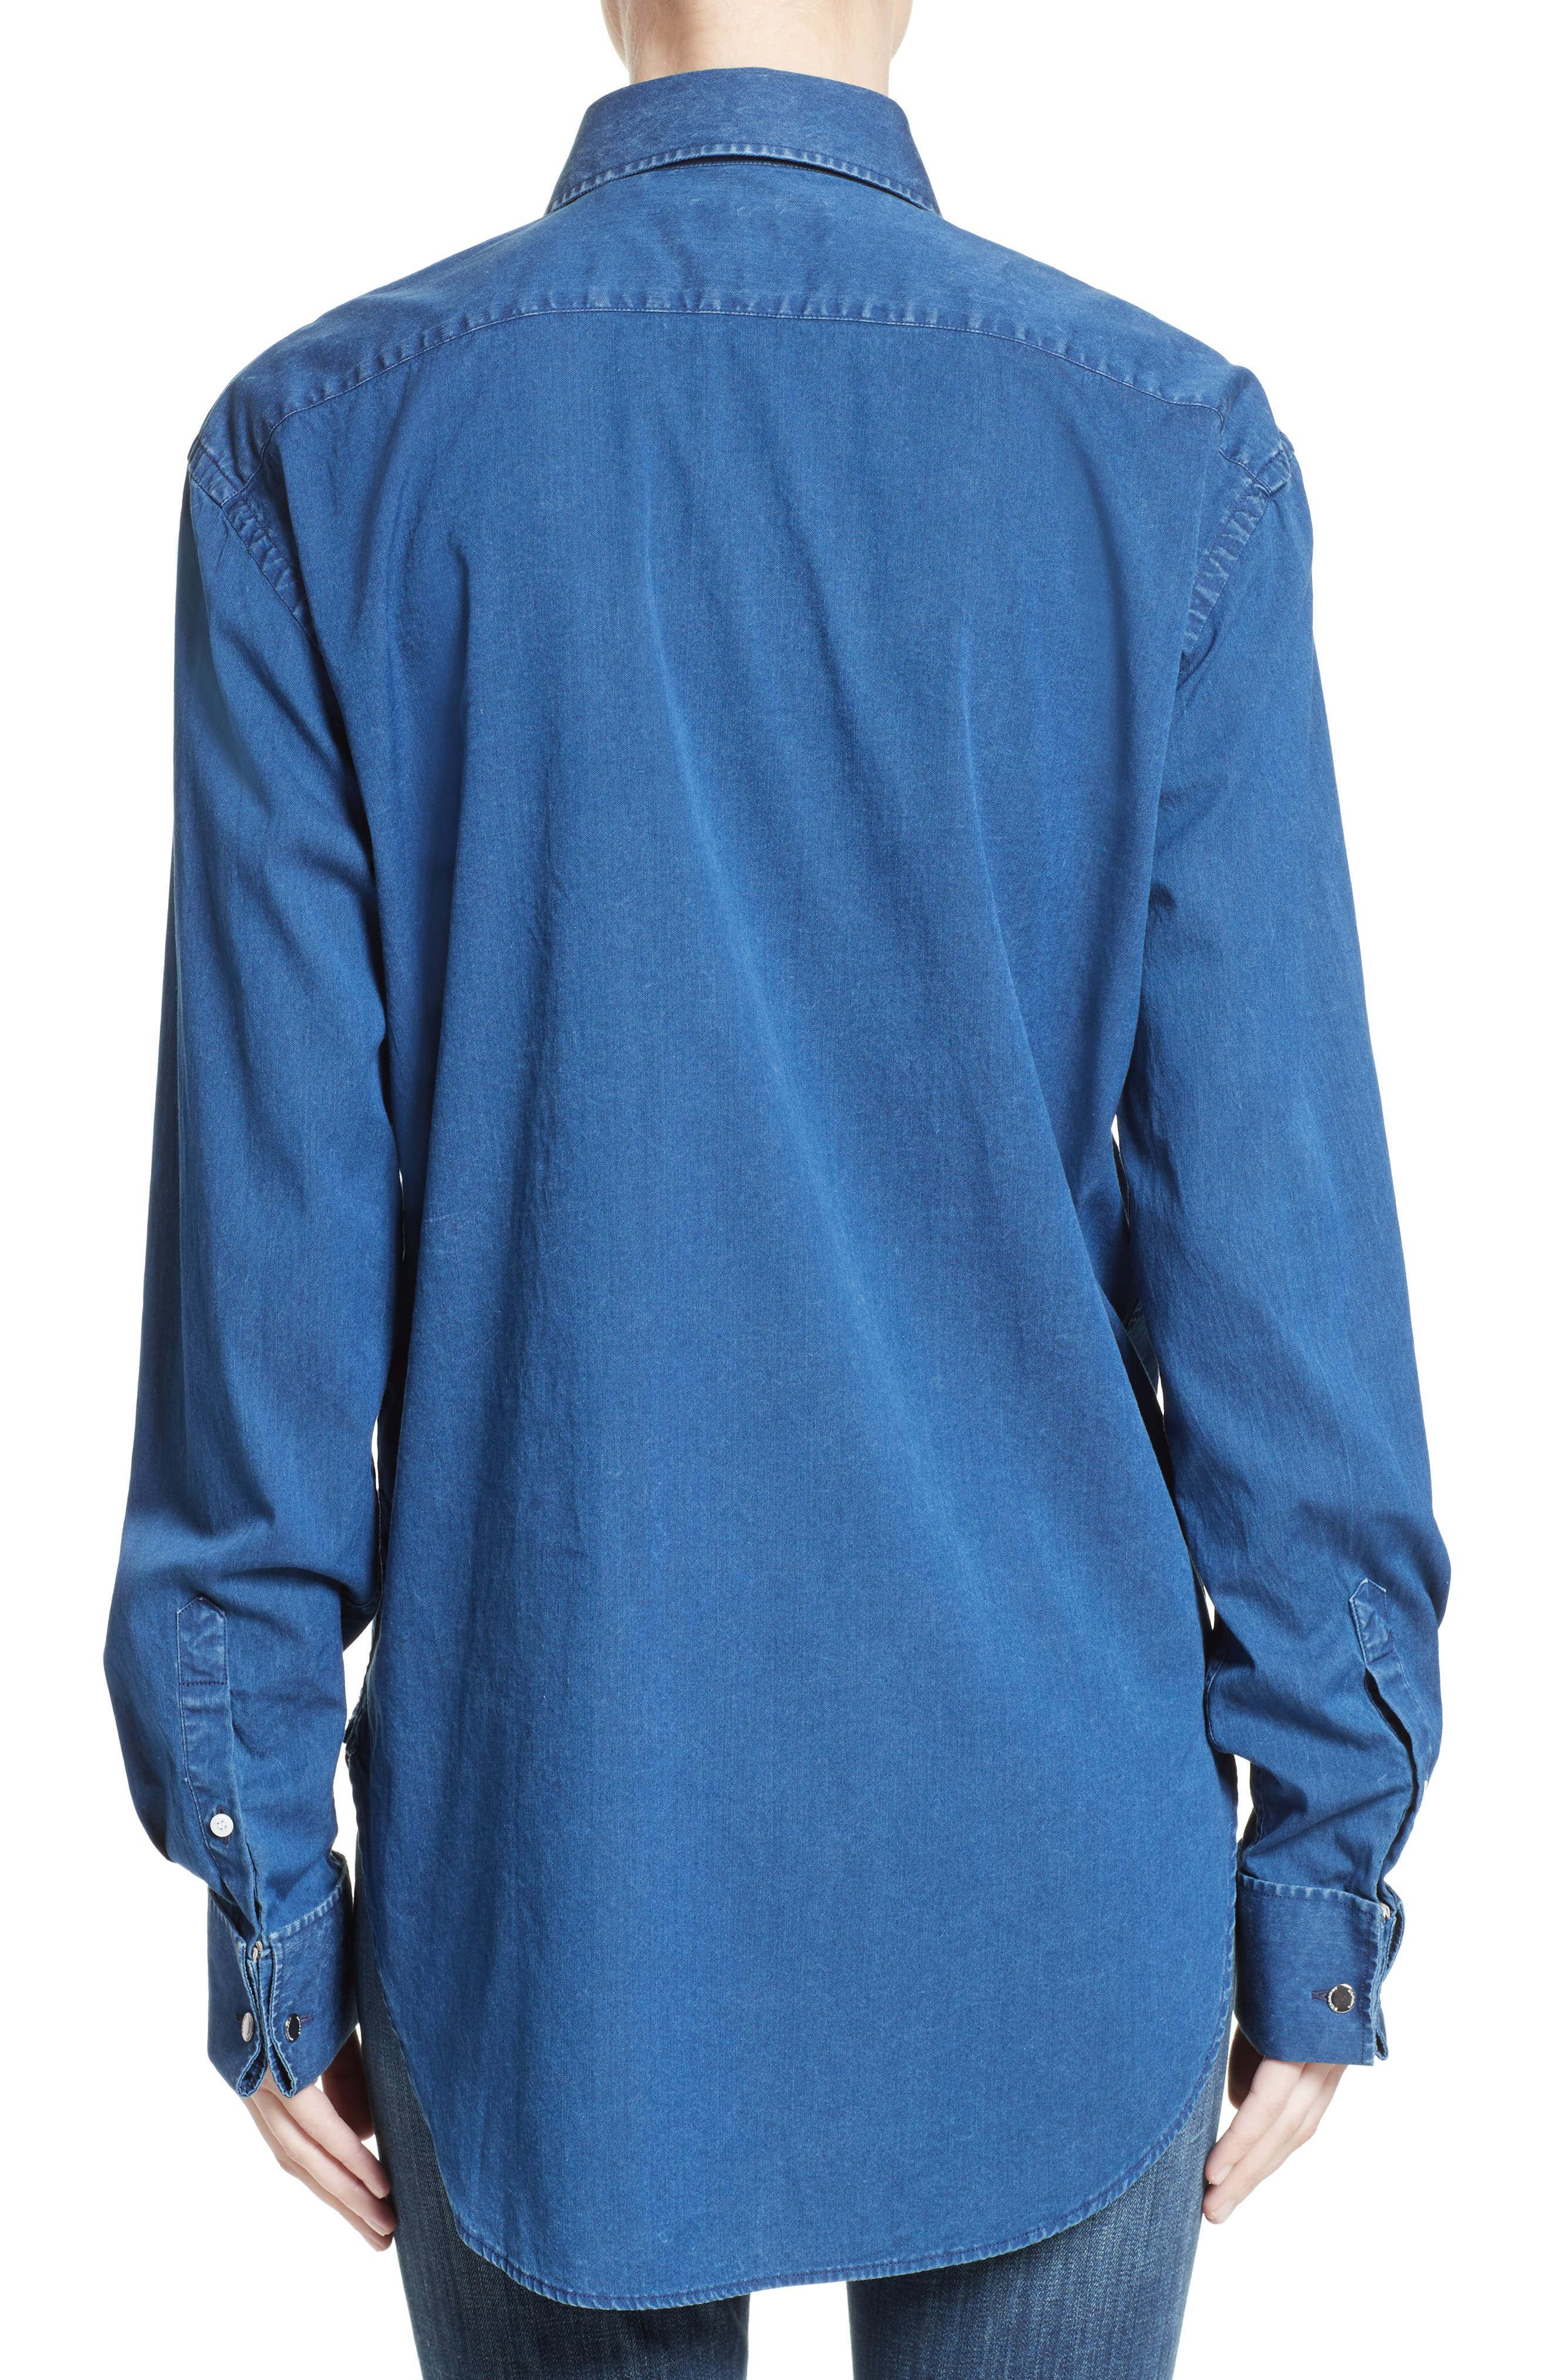 Jaden Pintuck Denim Shirt,                             Alternate thumbnail 2, color,                             409